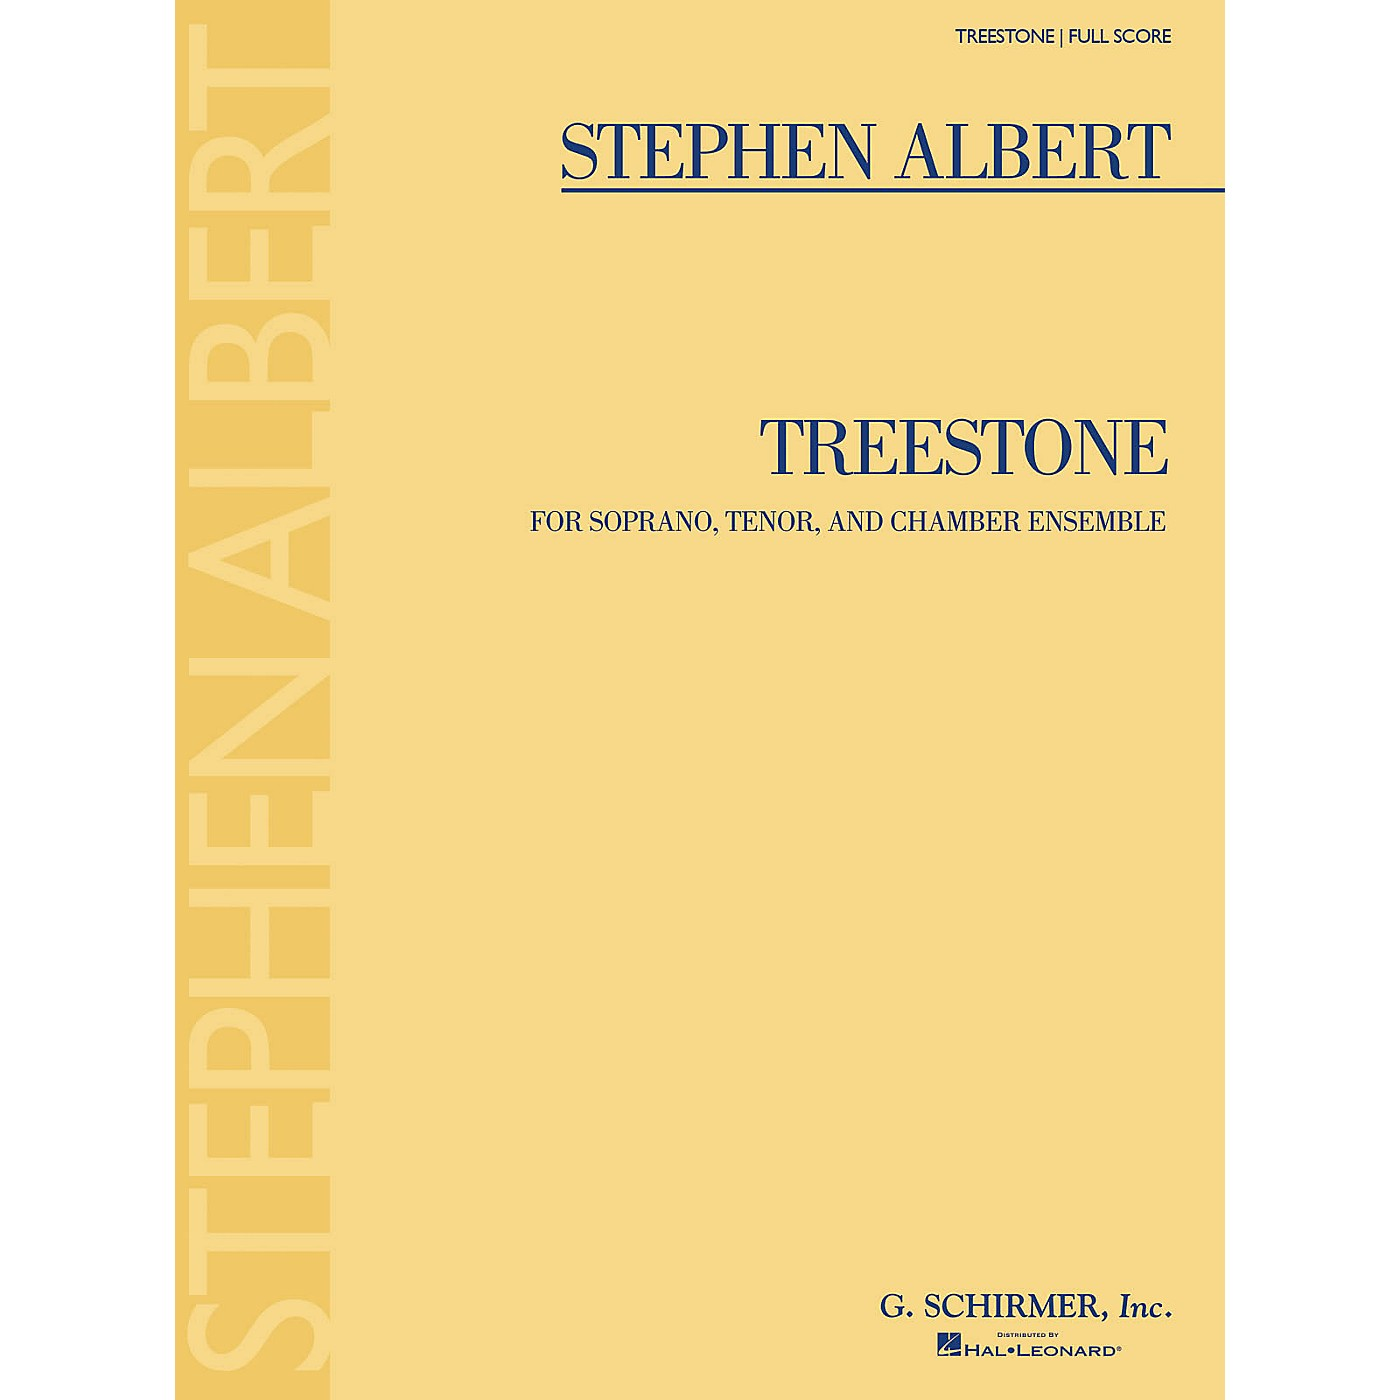 G. Schirmer Treestone (Study Score) Study Score Series Softcover Composed by Stephen Albert thumbnail